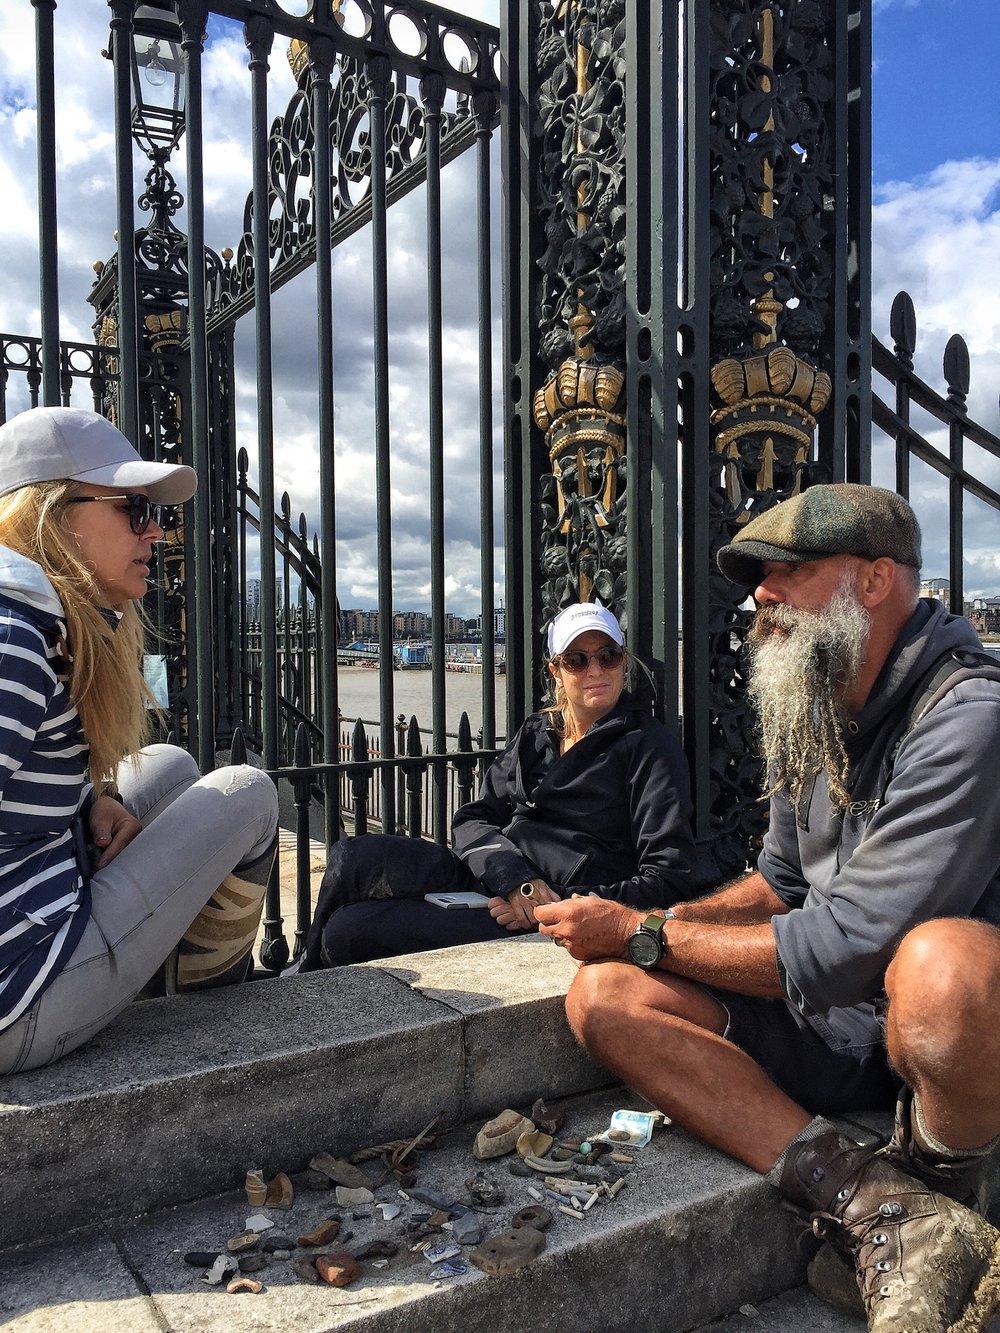 Sitting By Gate after morning of Mudlarking with Steve Brooker